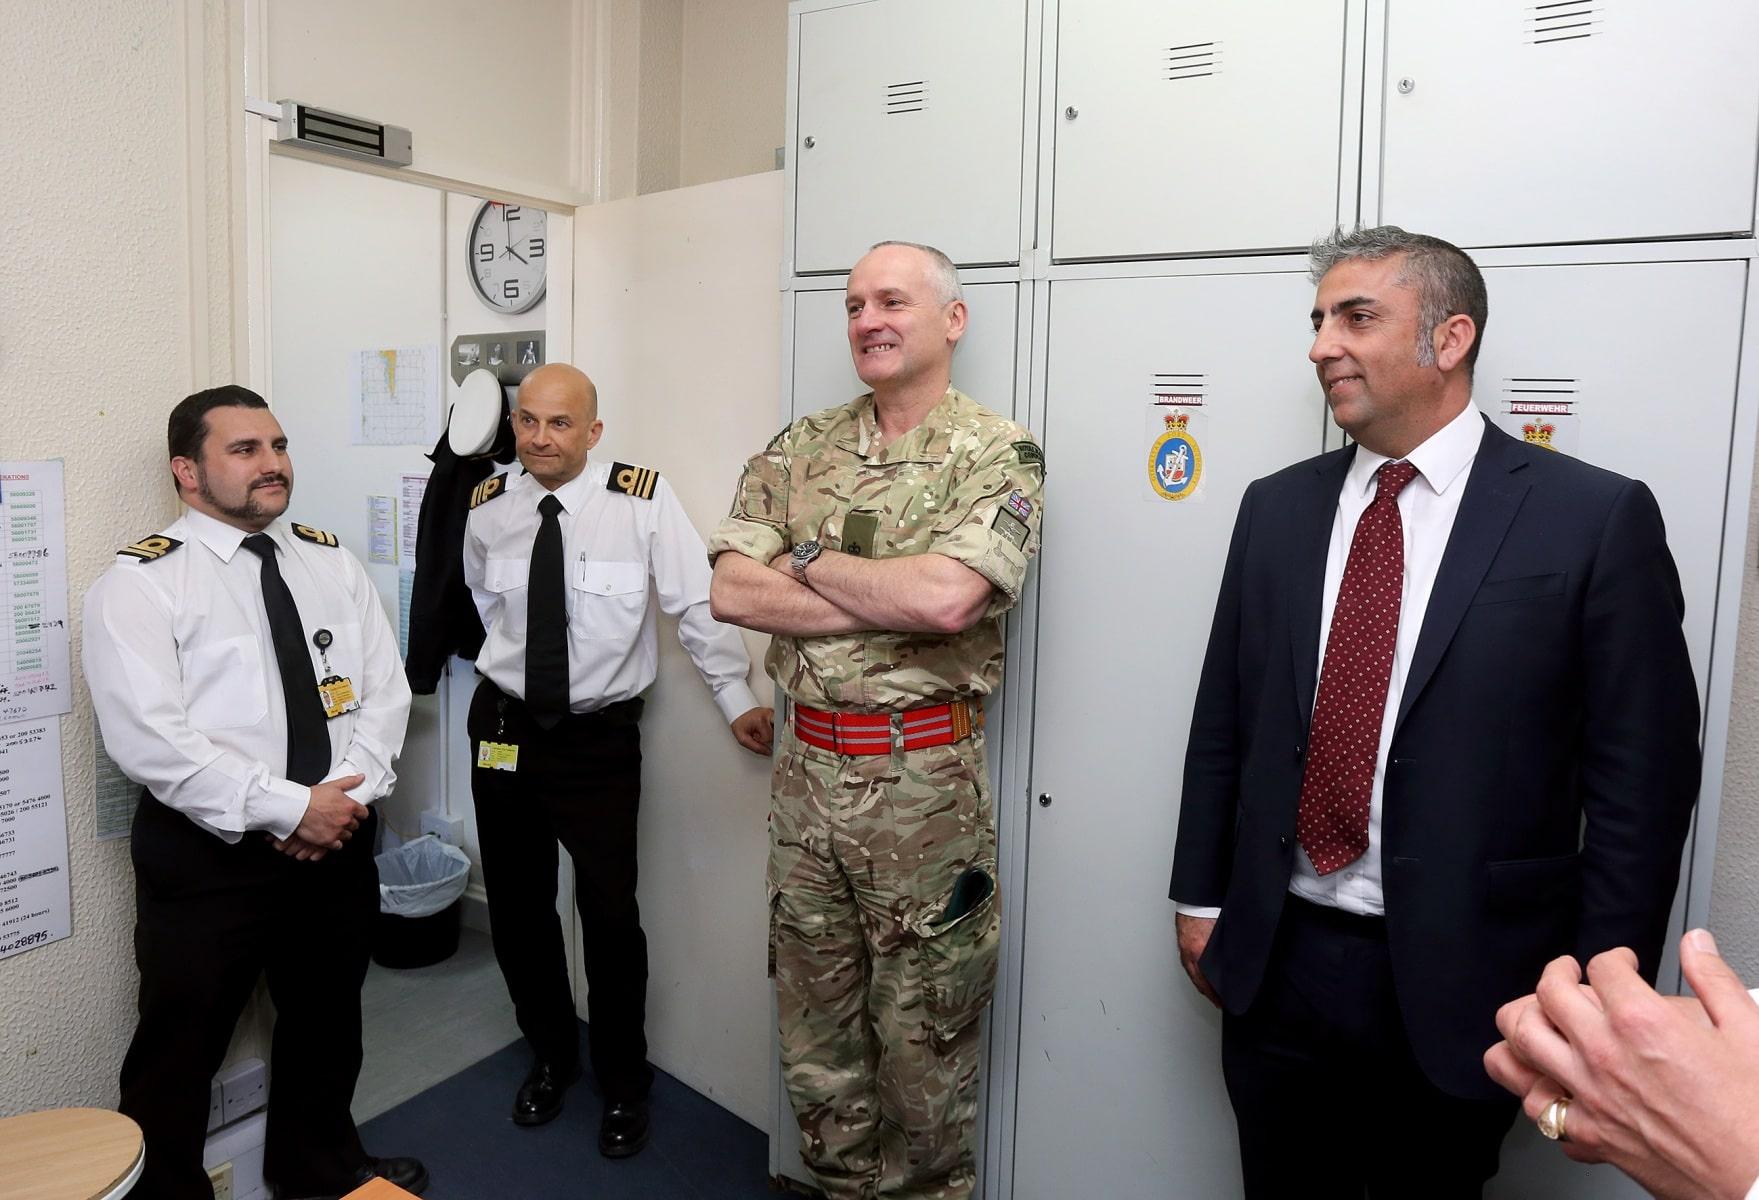 visita-oficial-del-gobernador-al-puerto-de-gibraltar_25549744404_o